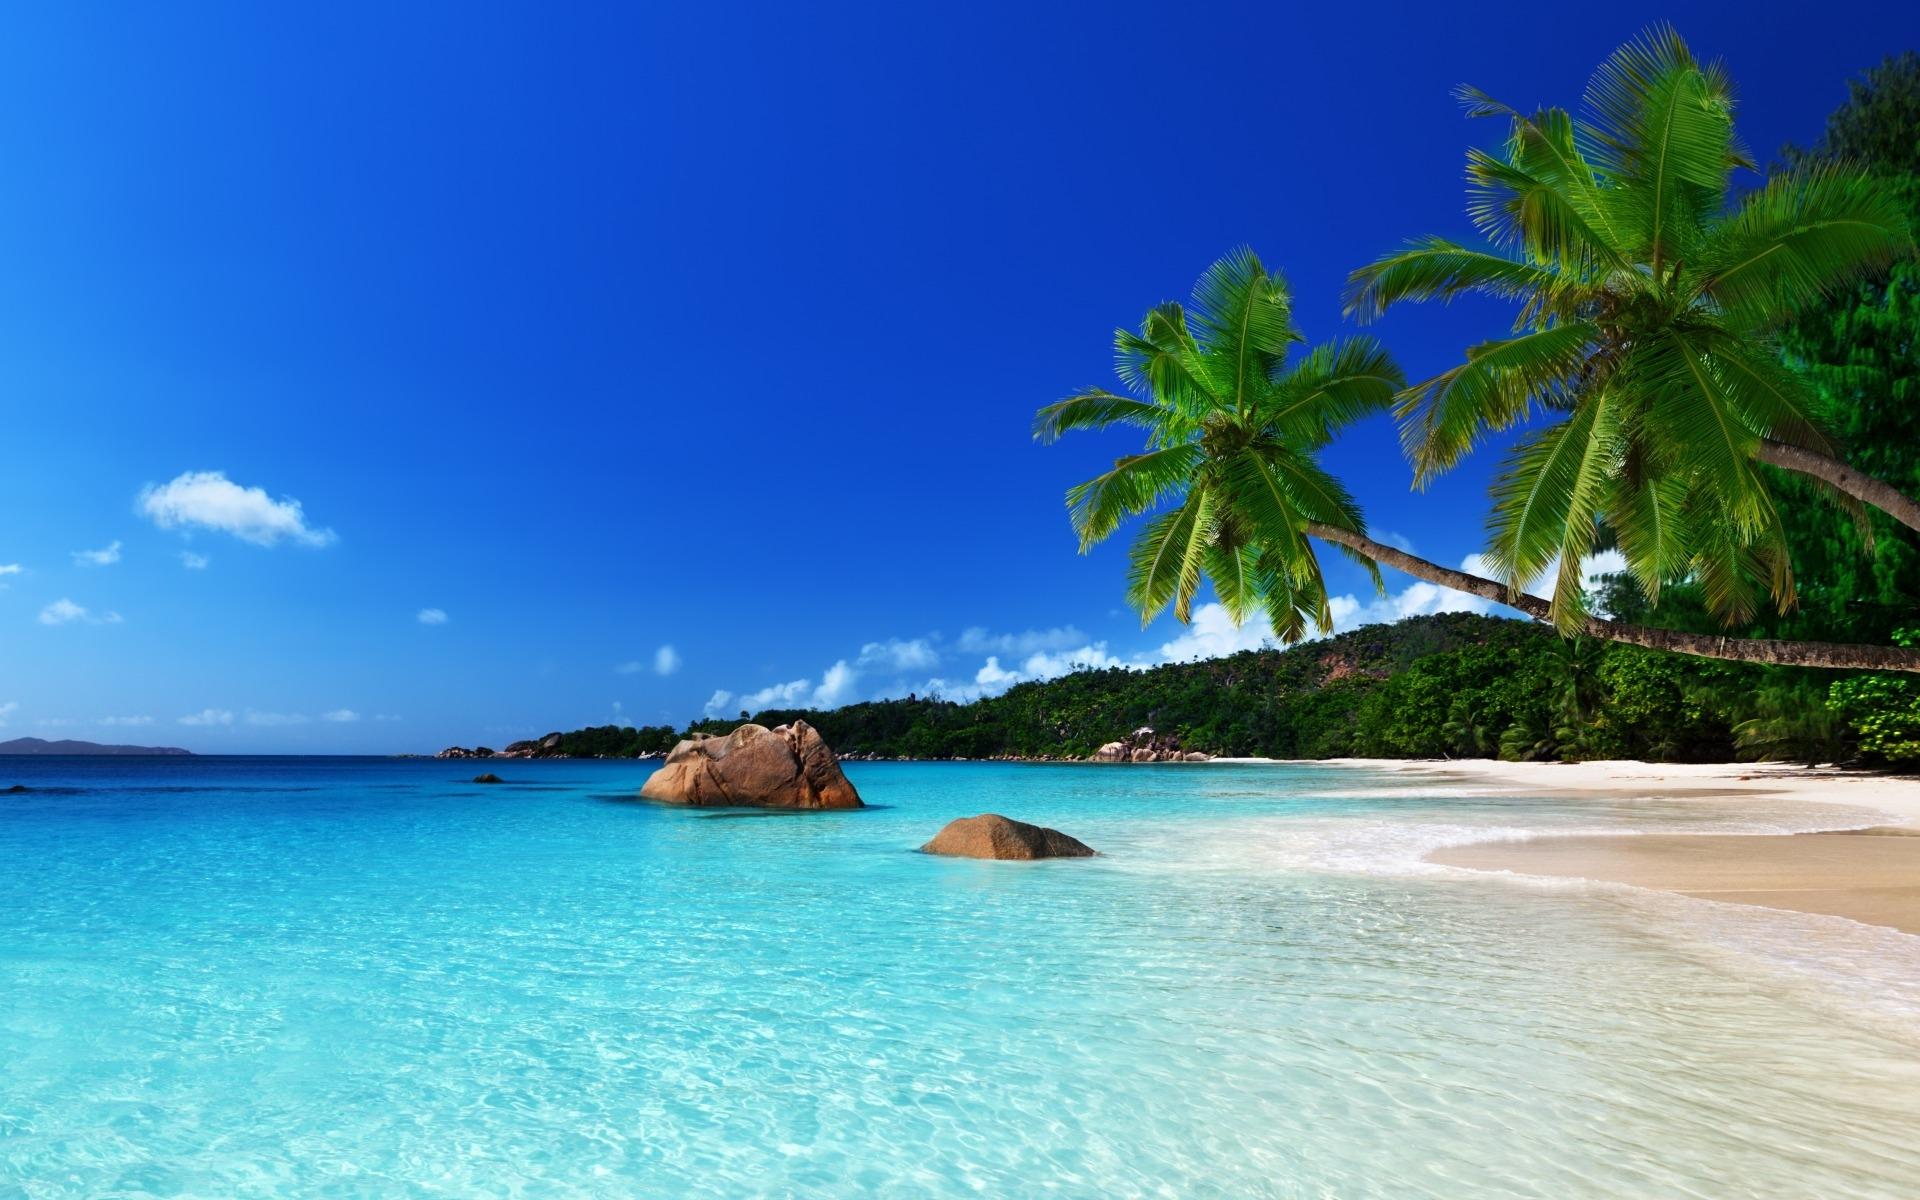 tropical-island Computer Wallpapers, Desktop Backgrounds ...